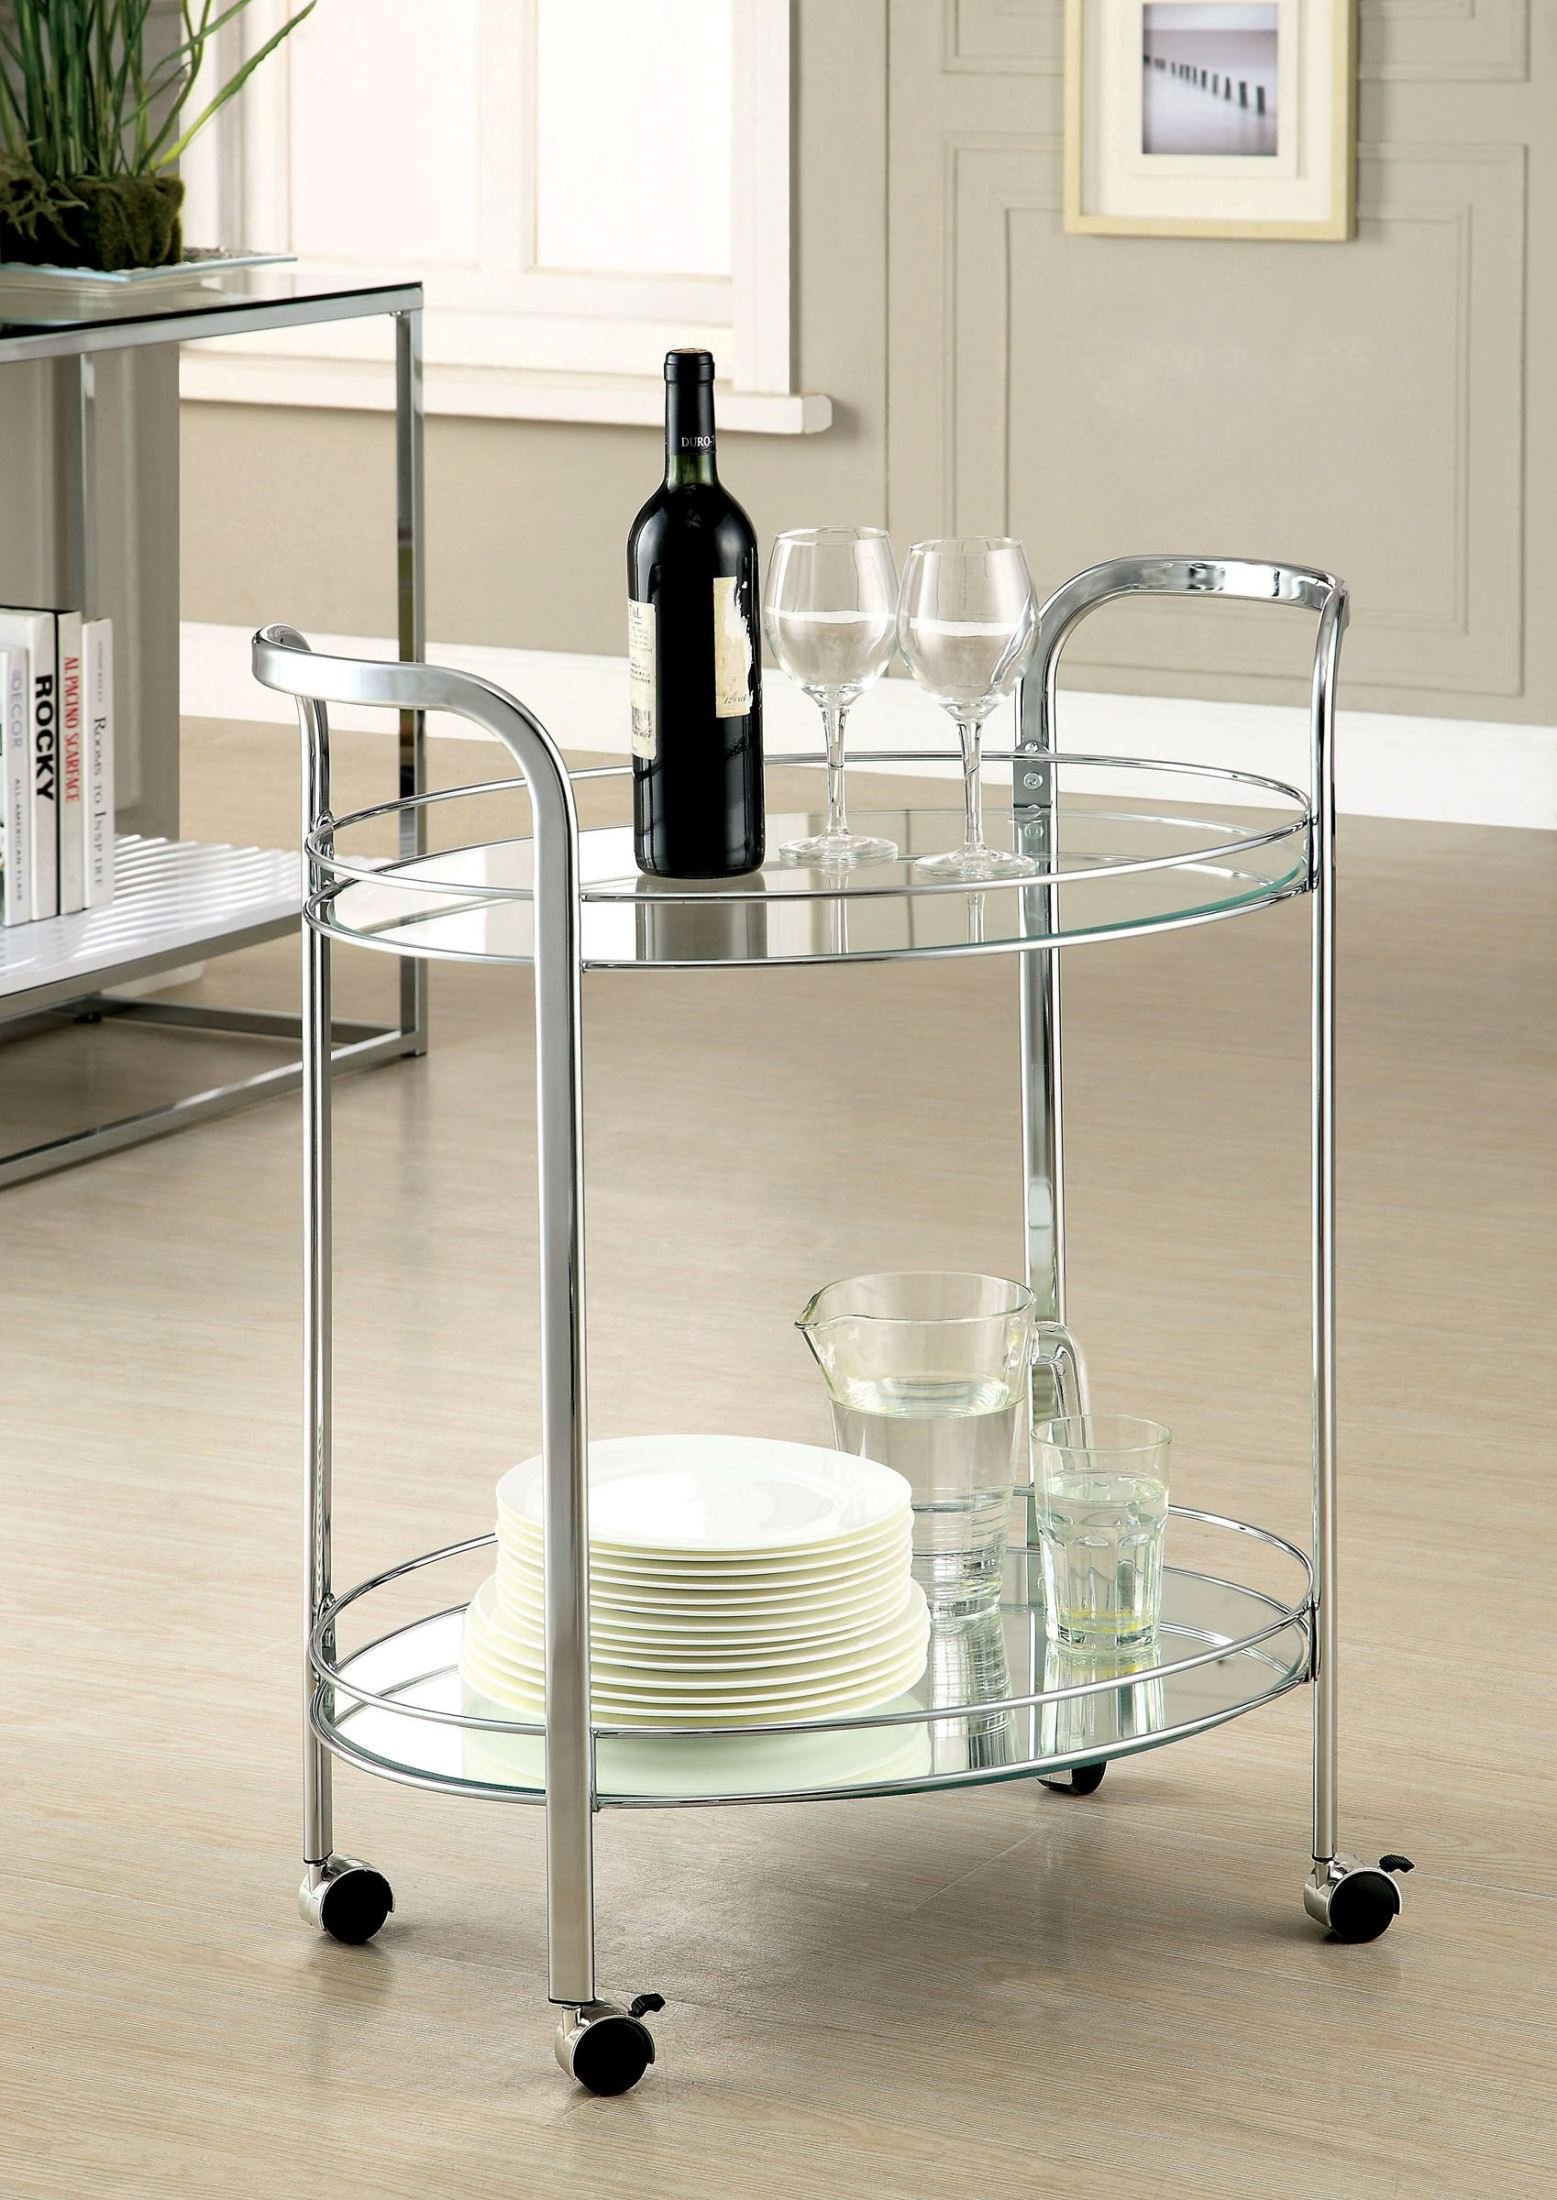 Furniture of America CM-AC228 Loule Chrome Serving Cart Kitchen Islands